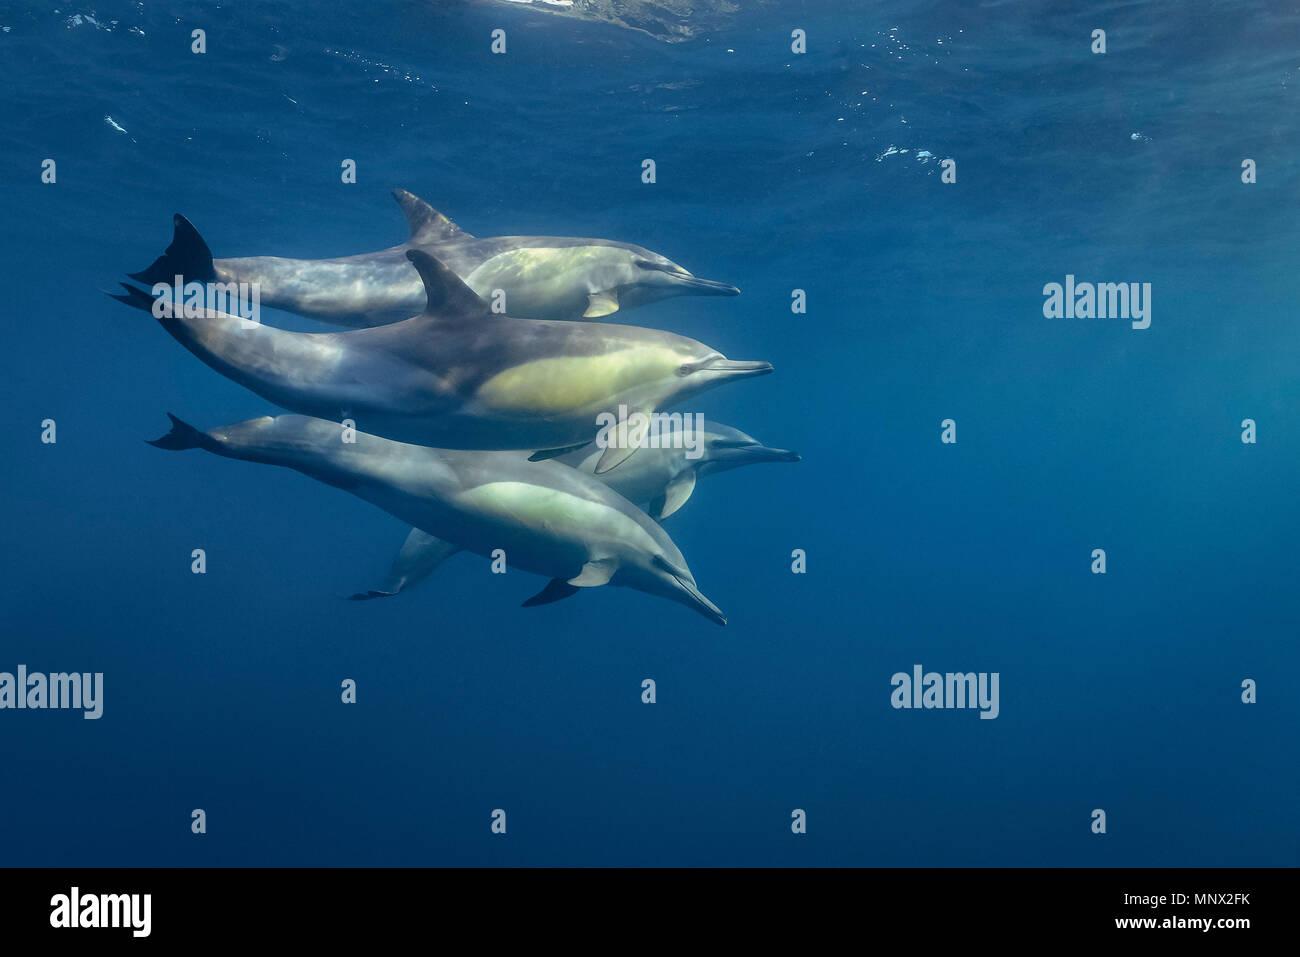 long-beaked common dolphin, Delphinus capensi, pod, South Africa, Porth Elisabeth, Algoa Bay, Indian Ocean - Stock Image